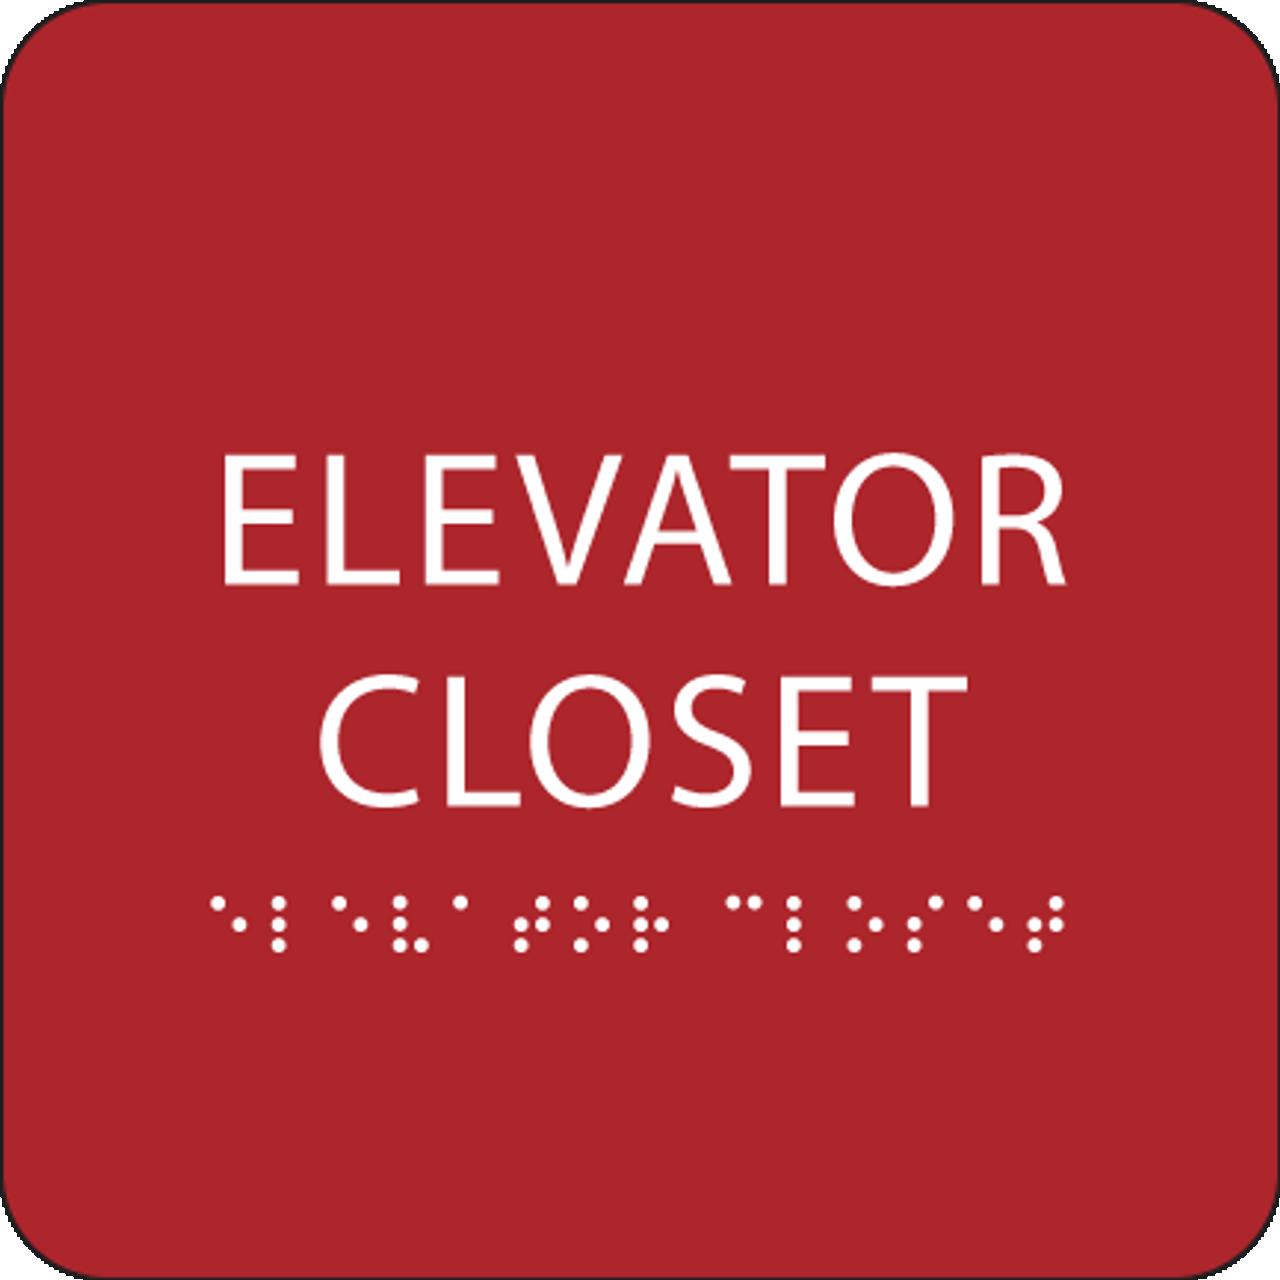 Red ADA Elevator Closet Sign